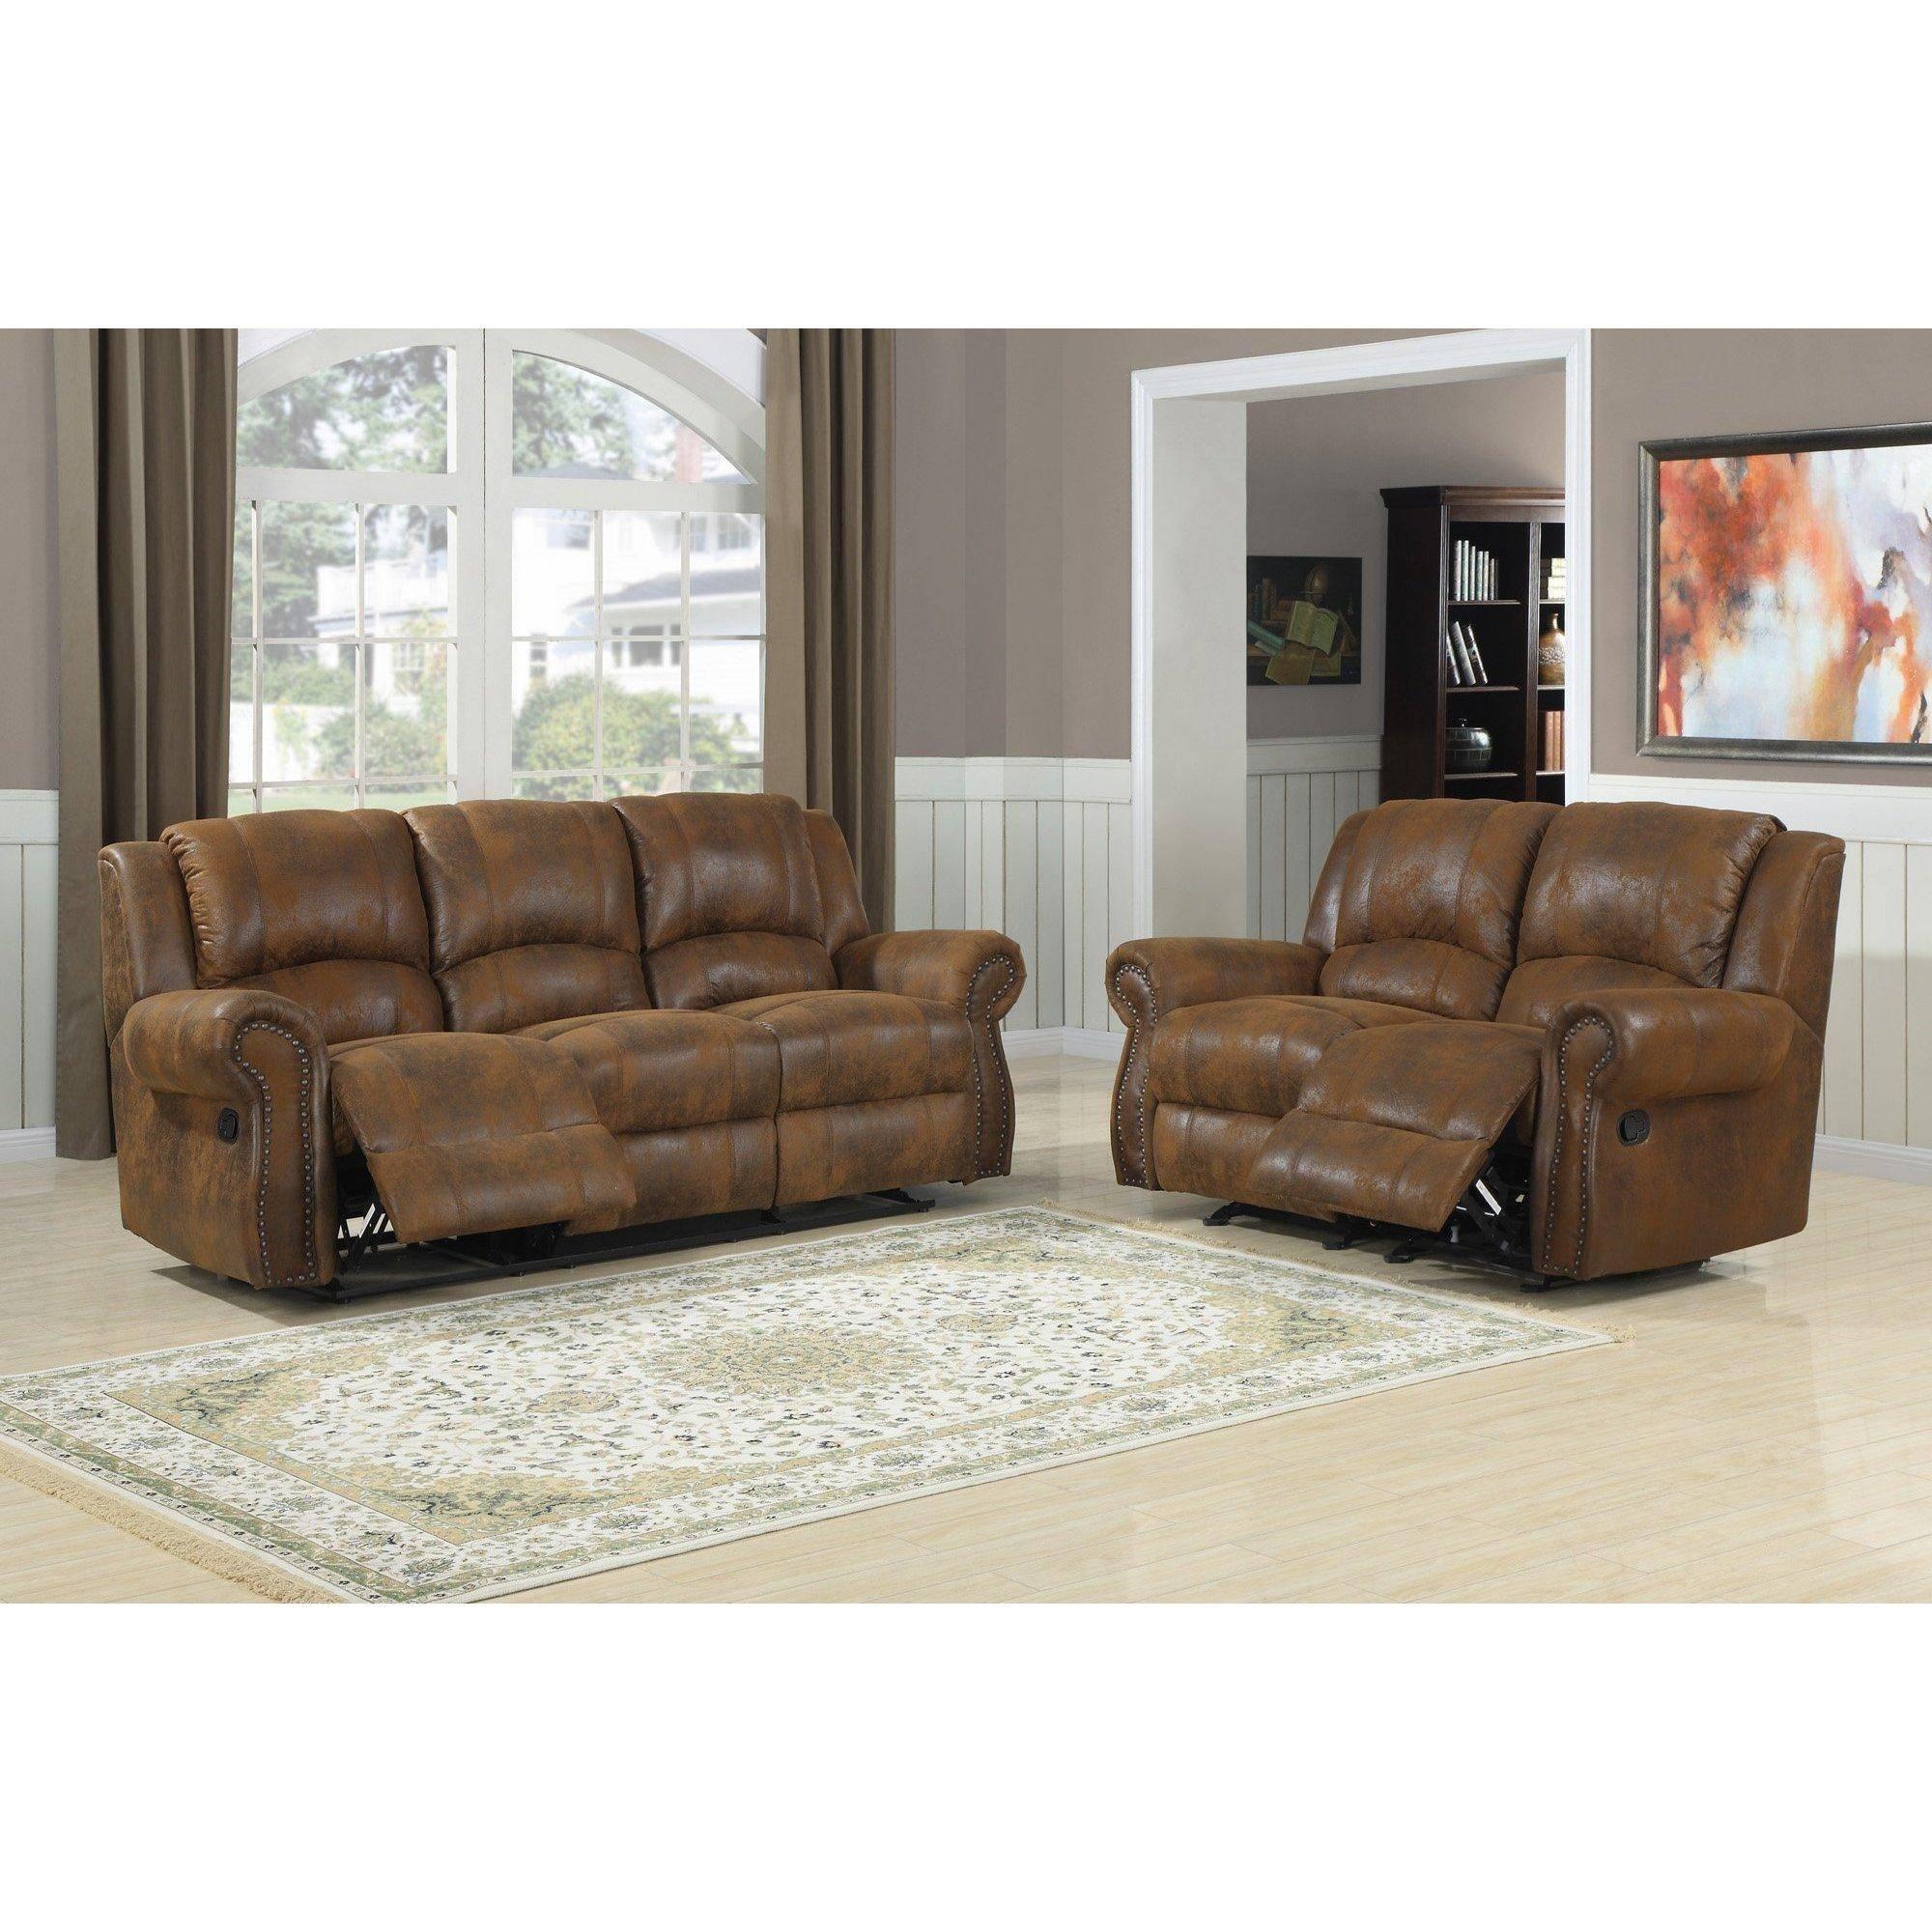 Sofa Ideas: Bomber Leather Sofas (Explore #7 Of 20 Photos) with regard to Bomber Leather Sofas (Image 15 of 15)